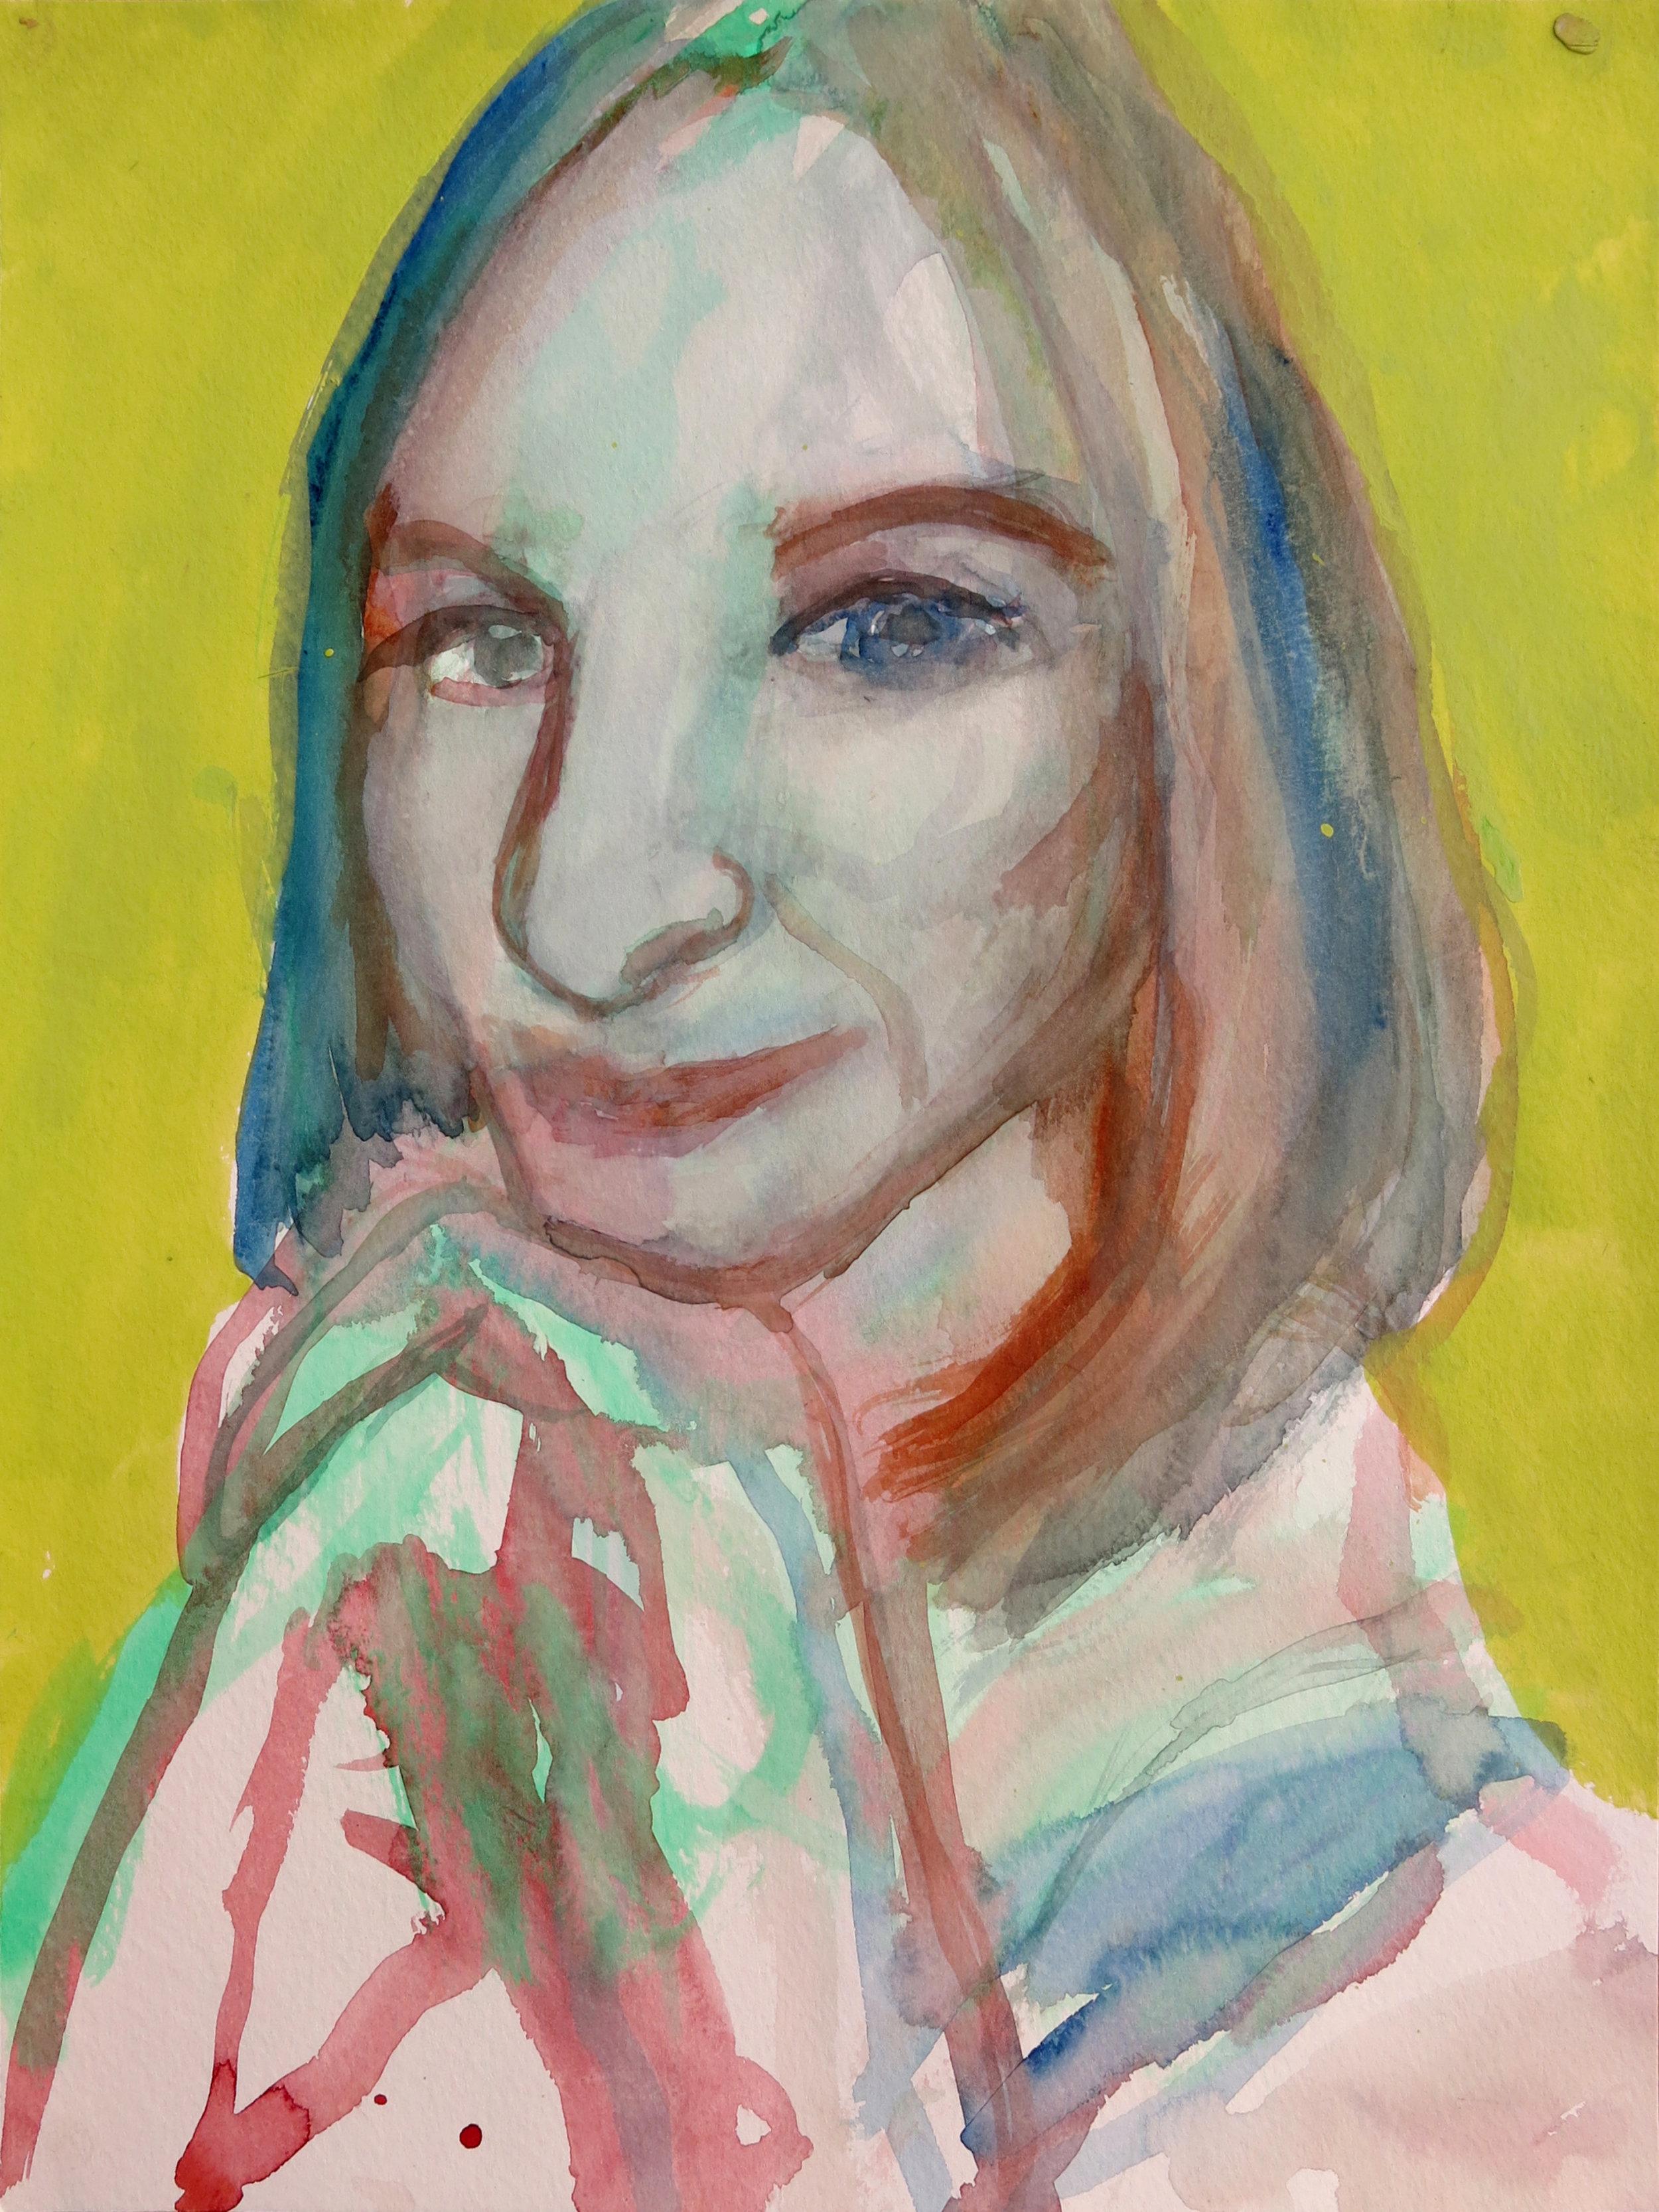 Barbra Streisand Portrait #171